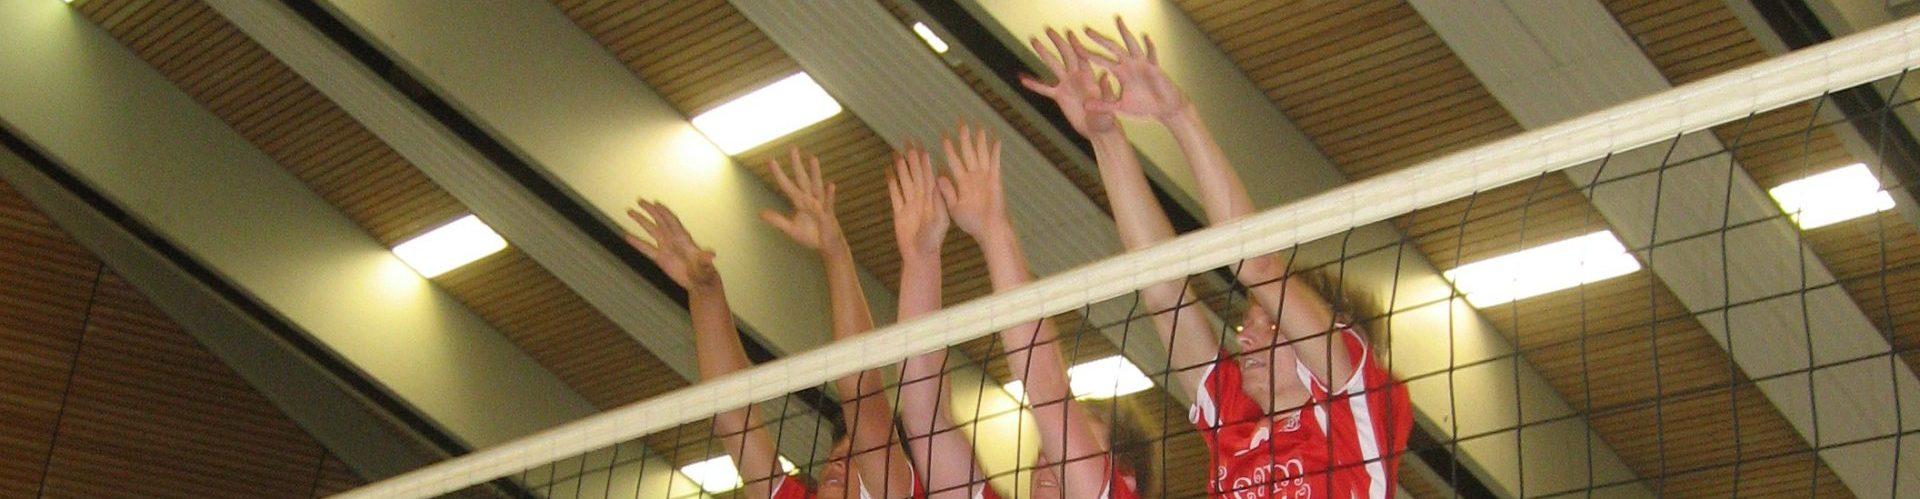 EK Volleyball